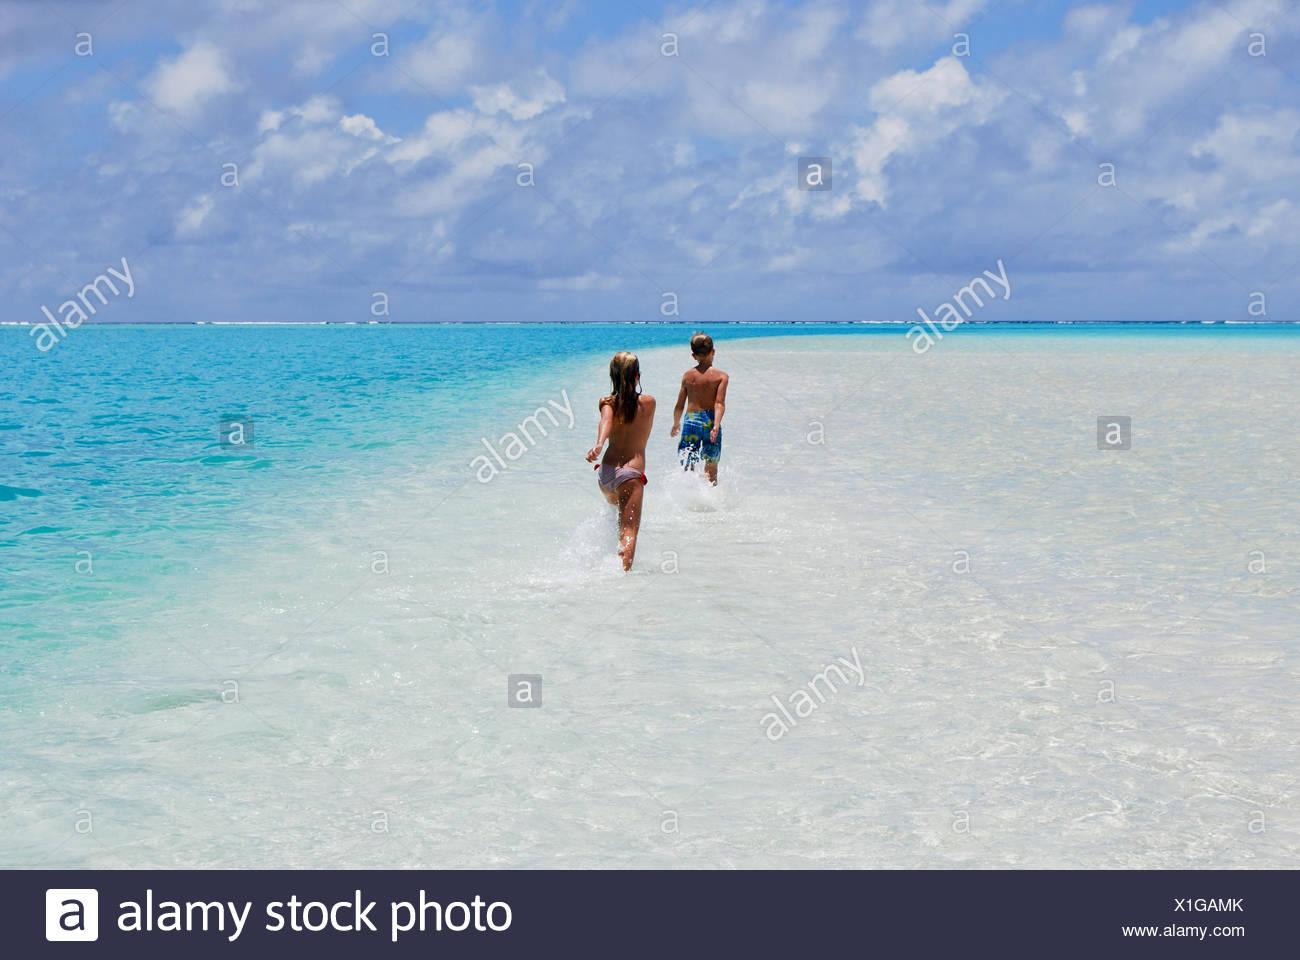 Zwei Kinder laufen auf Sandbank im Meer, Aitutaki, Cook-Inseln Stockbild